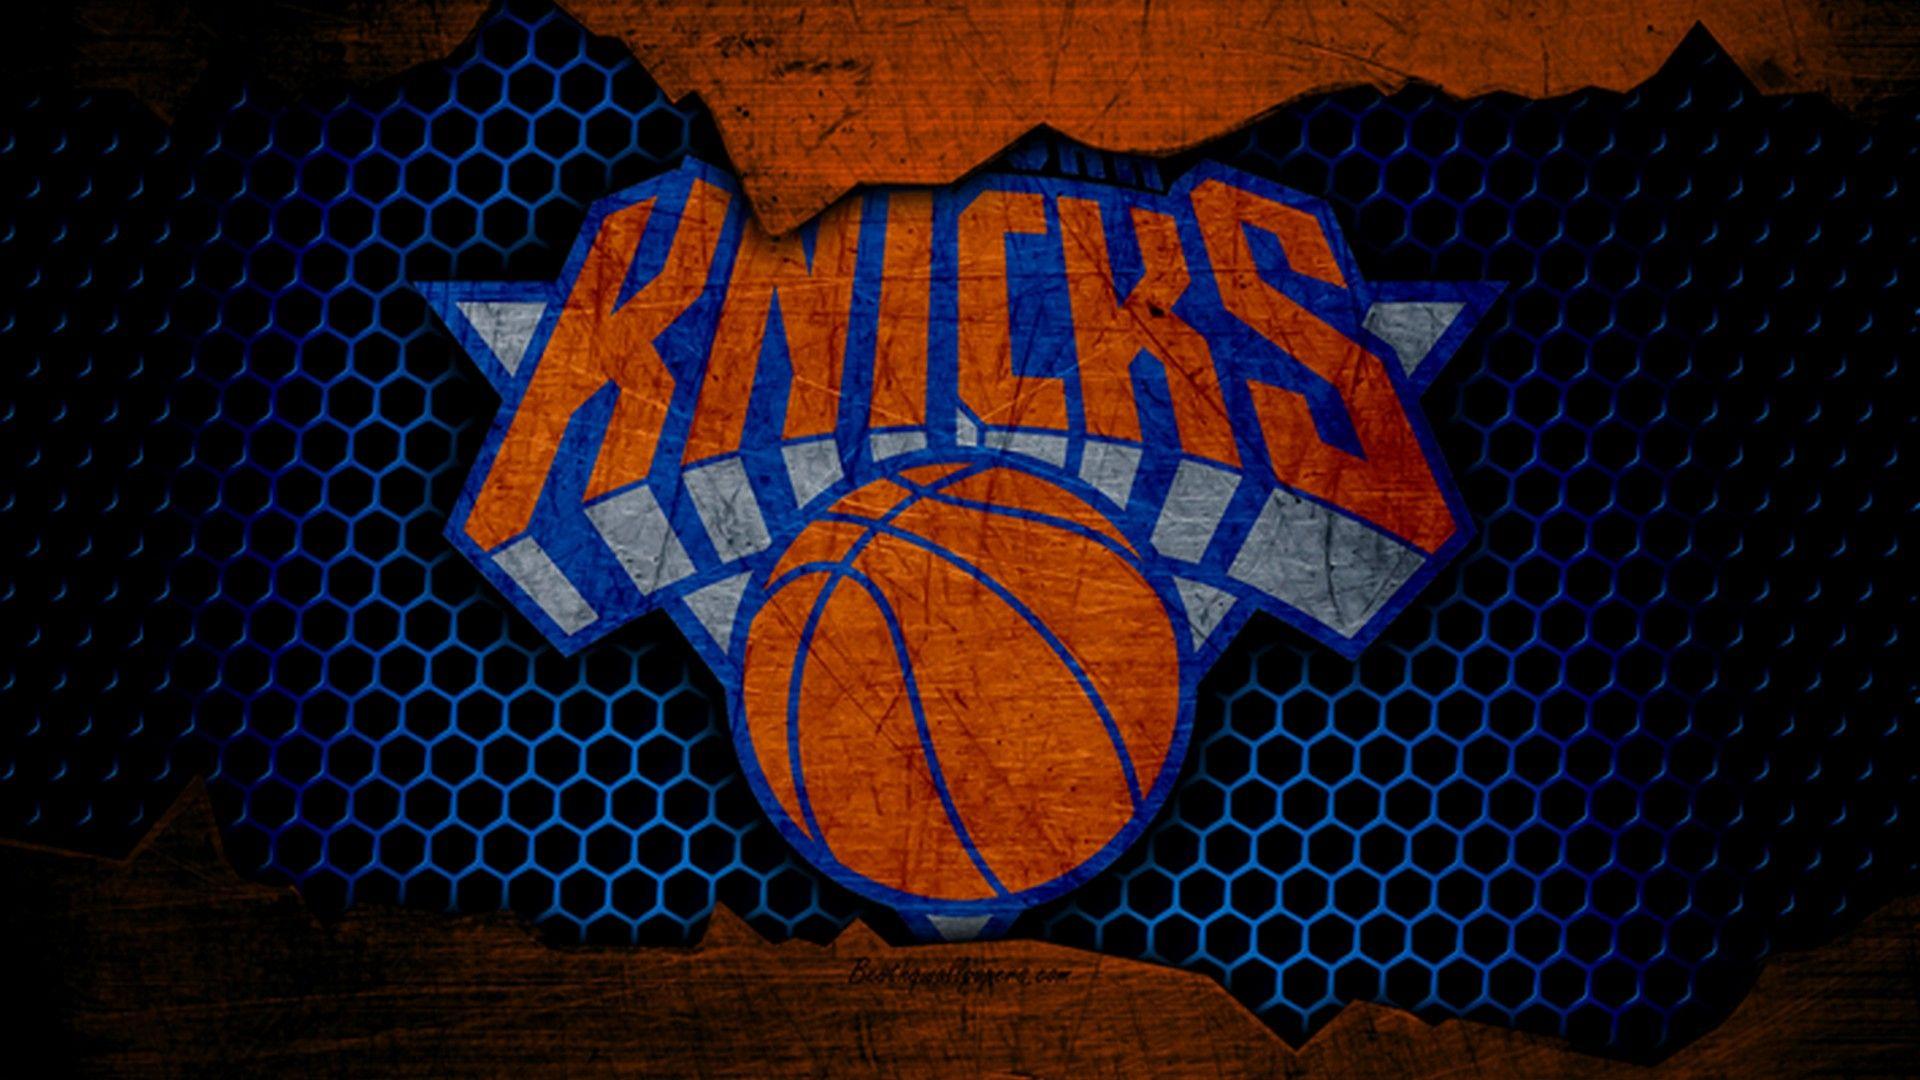 Wallpaper Desktop New York Knicks Hd Is The Perfect High Quality